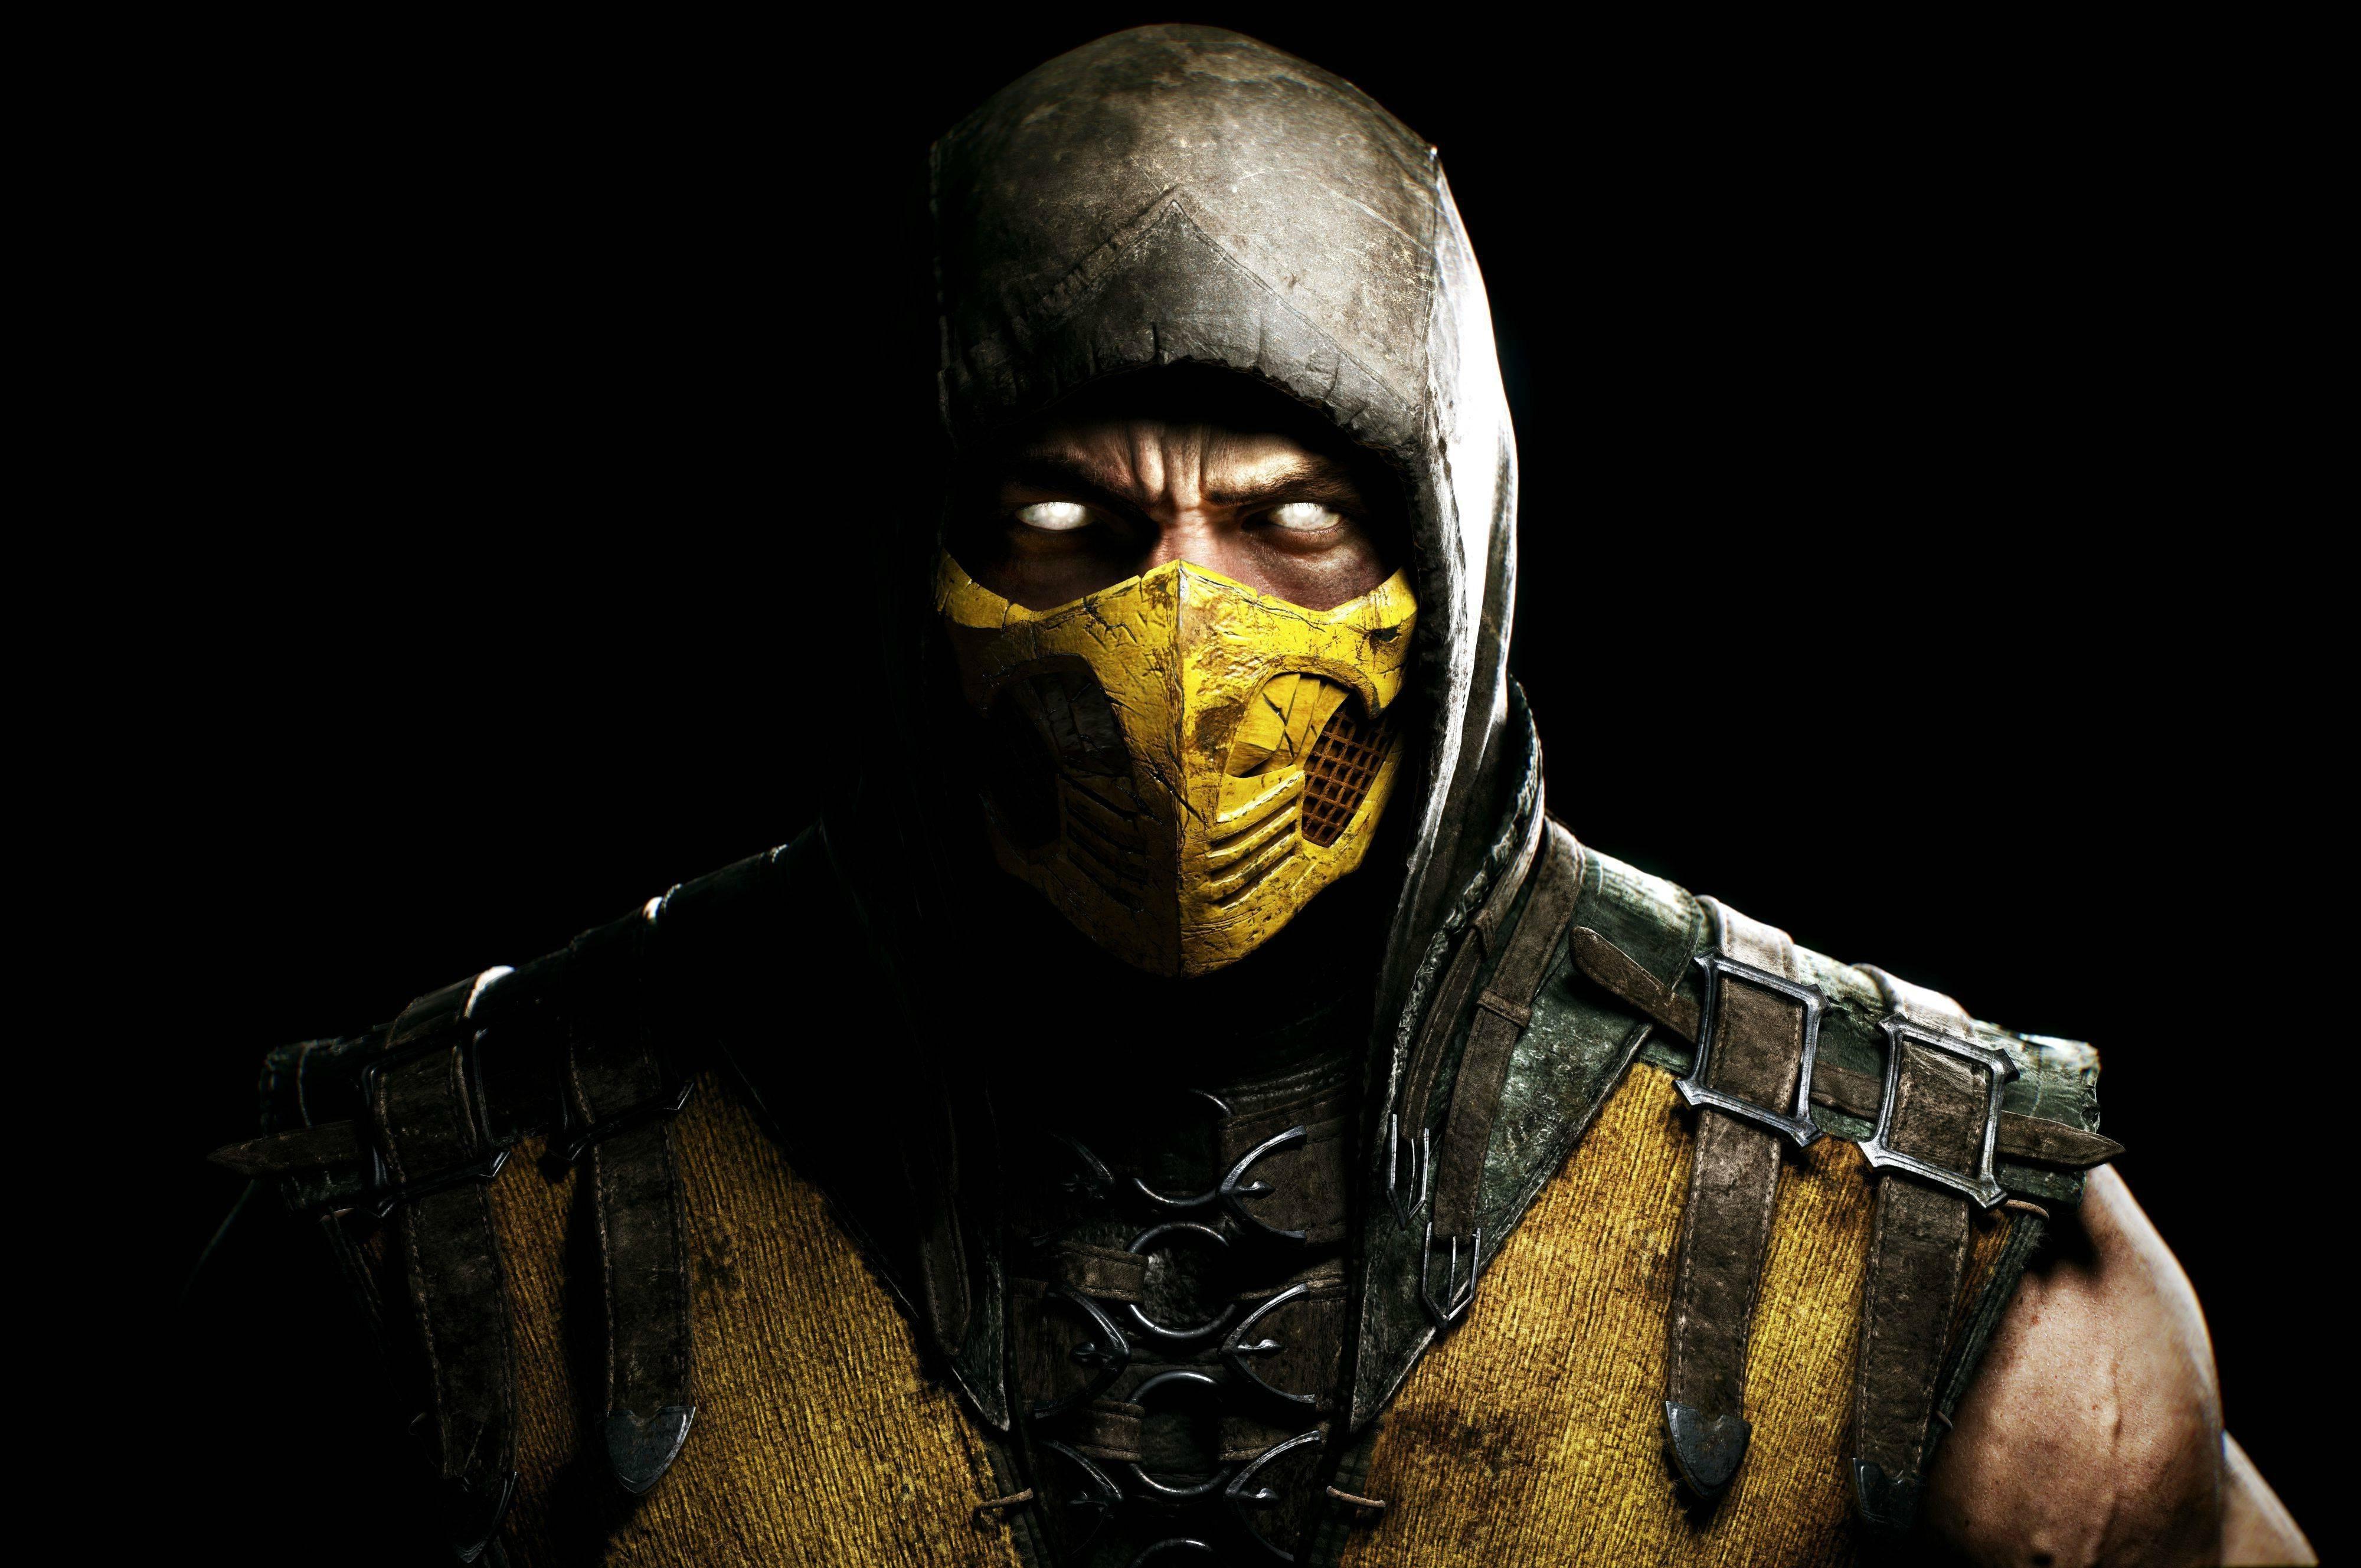 Wallpaper 4000x2657 Px Face Mortal Kombat X Scorpion